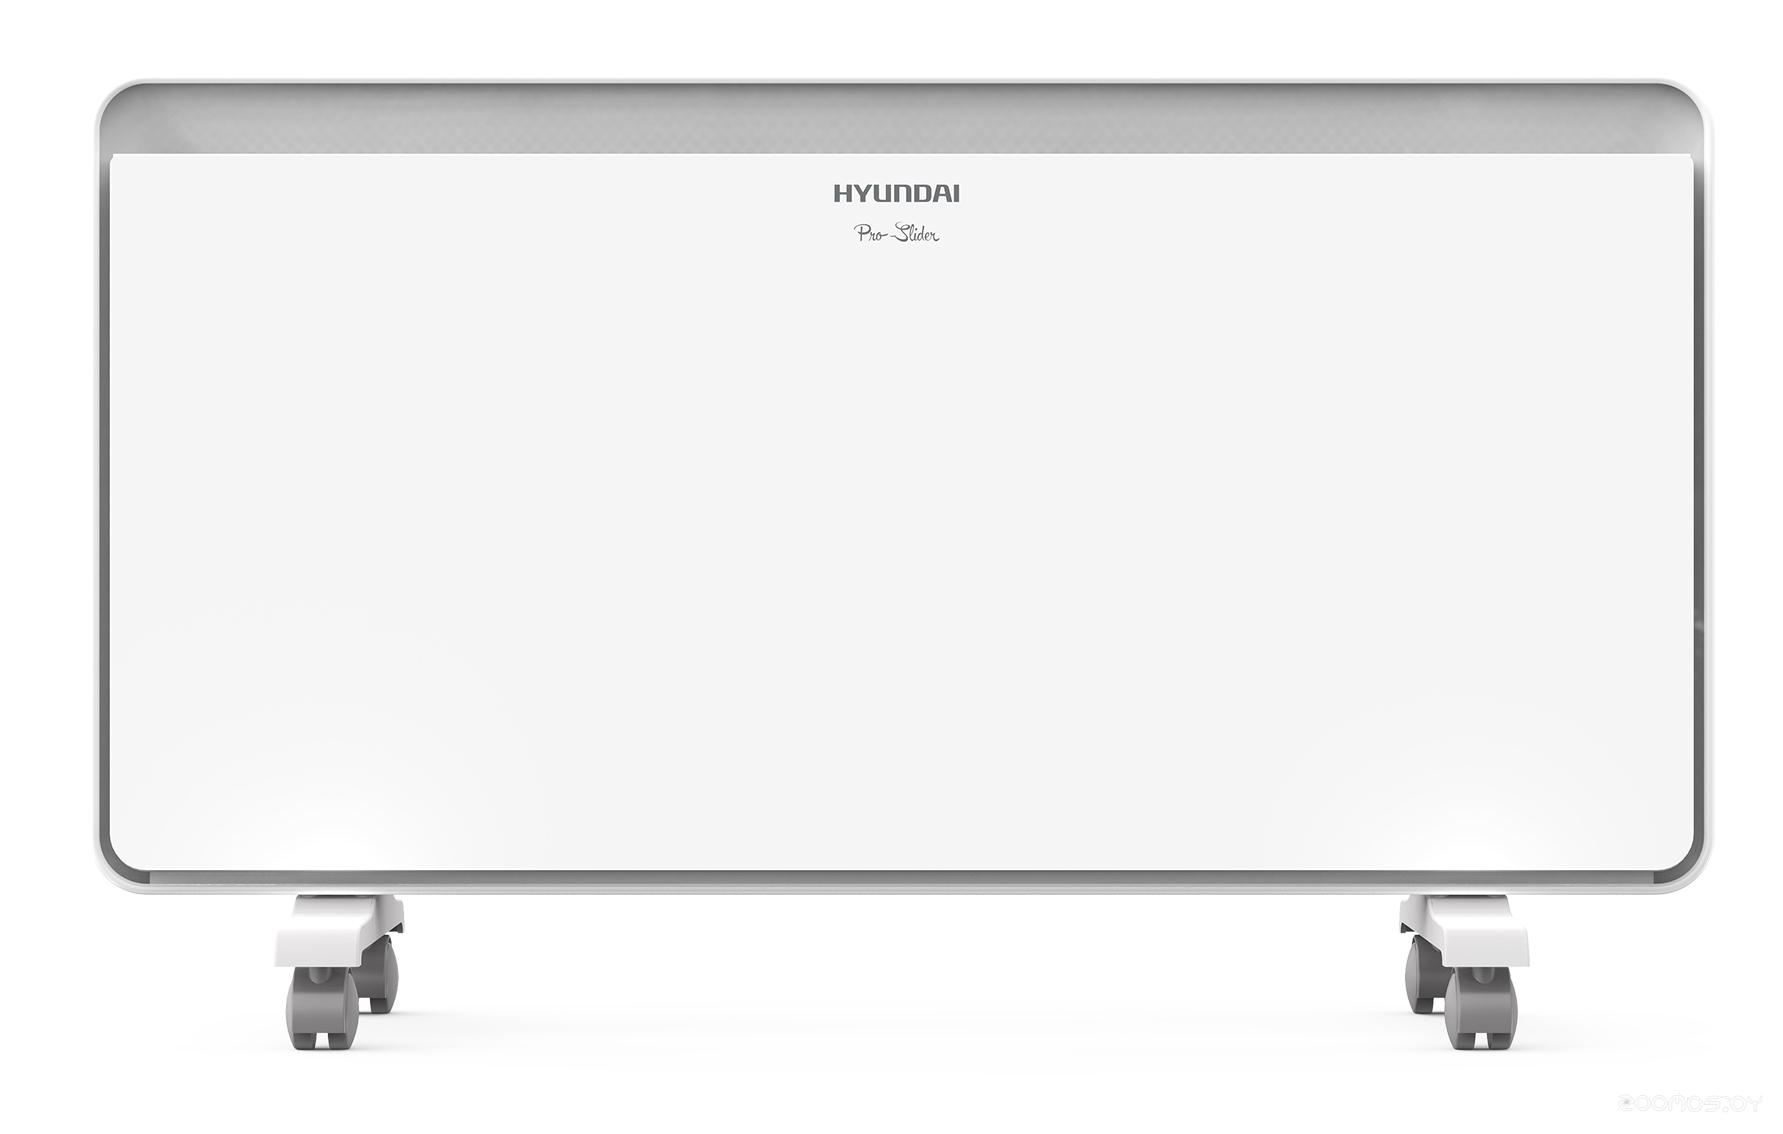 Конвектор Hyundai H-HV1-15-UI563